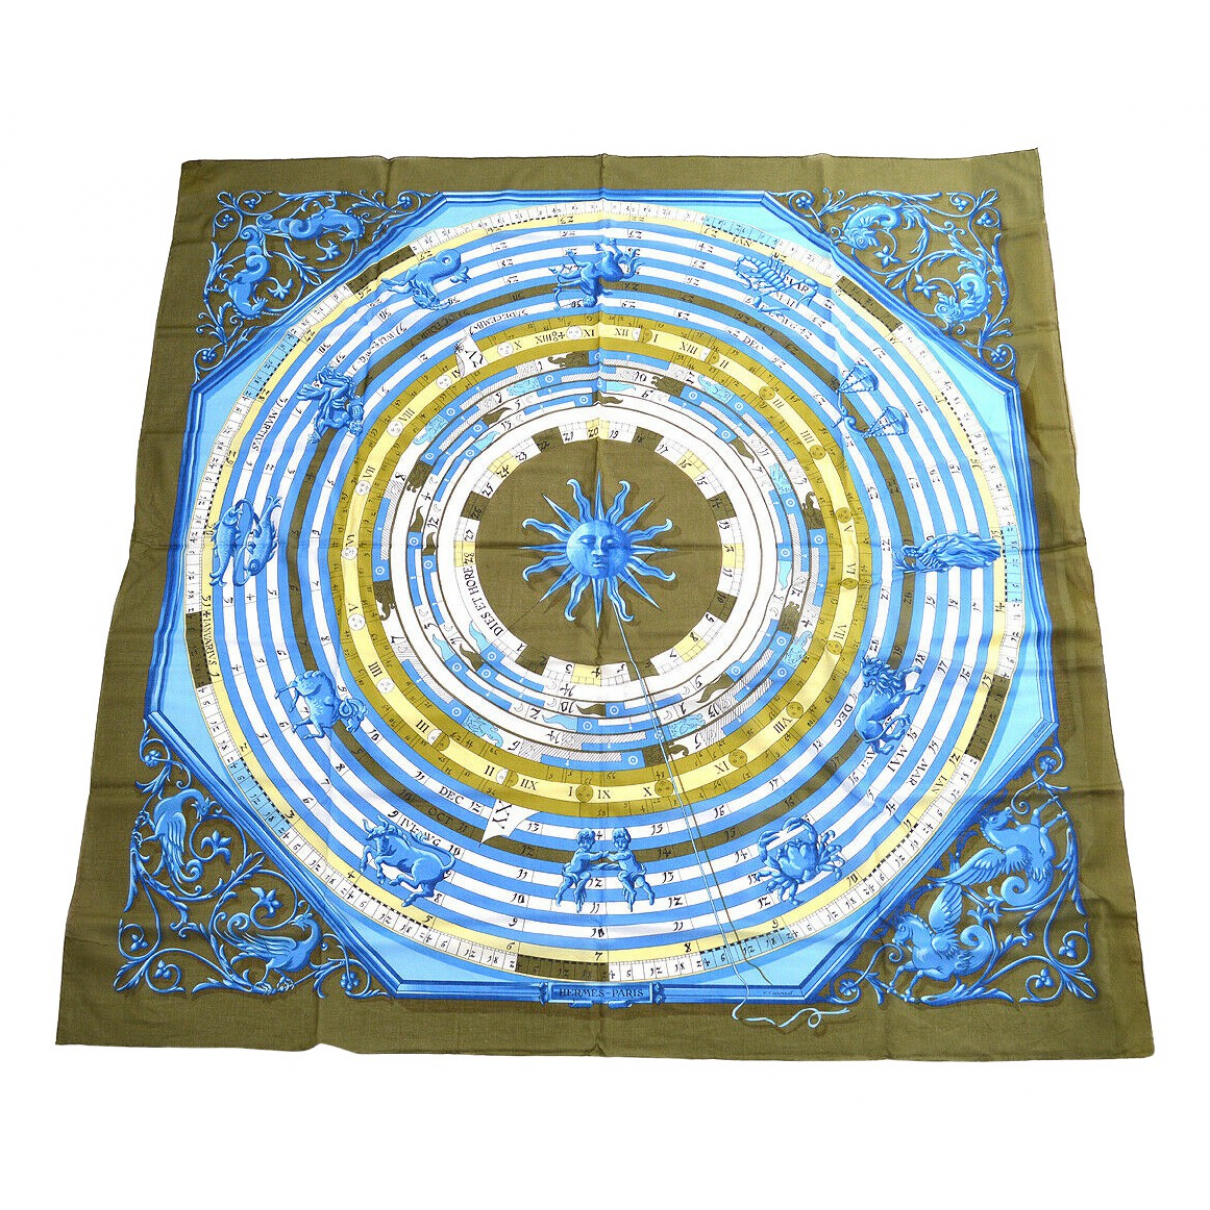 Pañuelo Carre Geant silk 140 Hermes